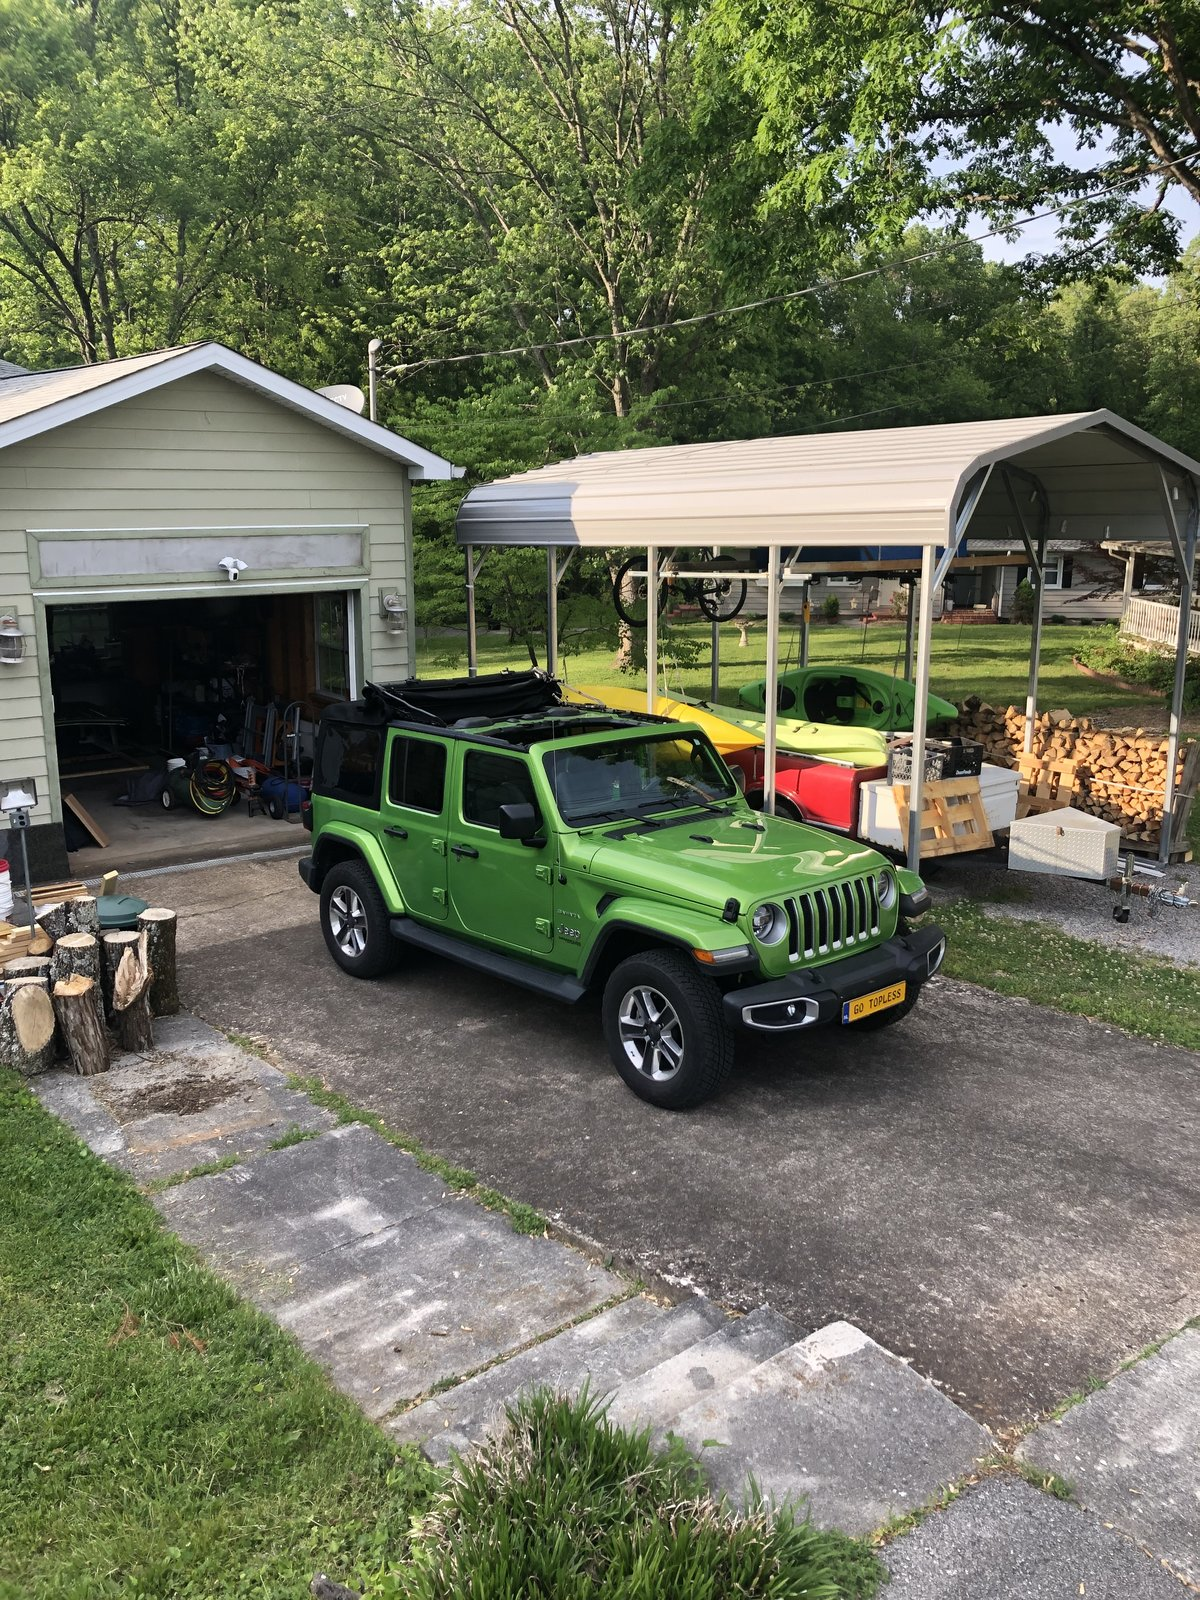 Jeep Summer Tops : summer, Should, Spend, Money, Summer??, 2018+, Wrangler, Forums, Rubicon,, Sahara,, Sport,, Unlimited, JLwranglerforums.com